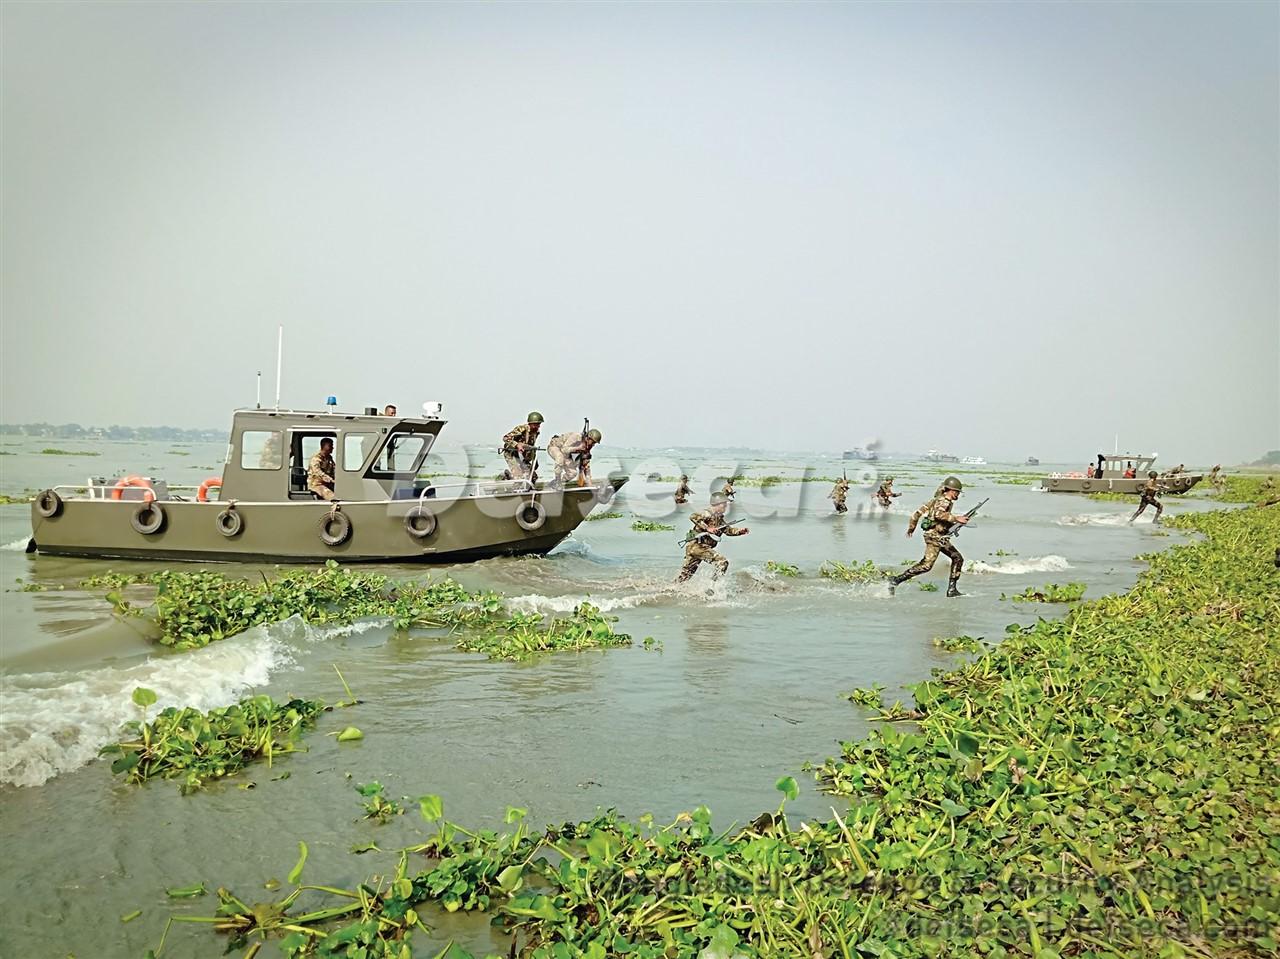 Bangladesh Army's new generation watercraft tested